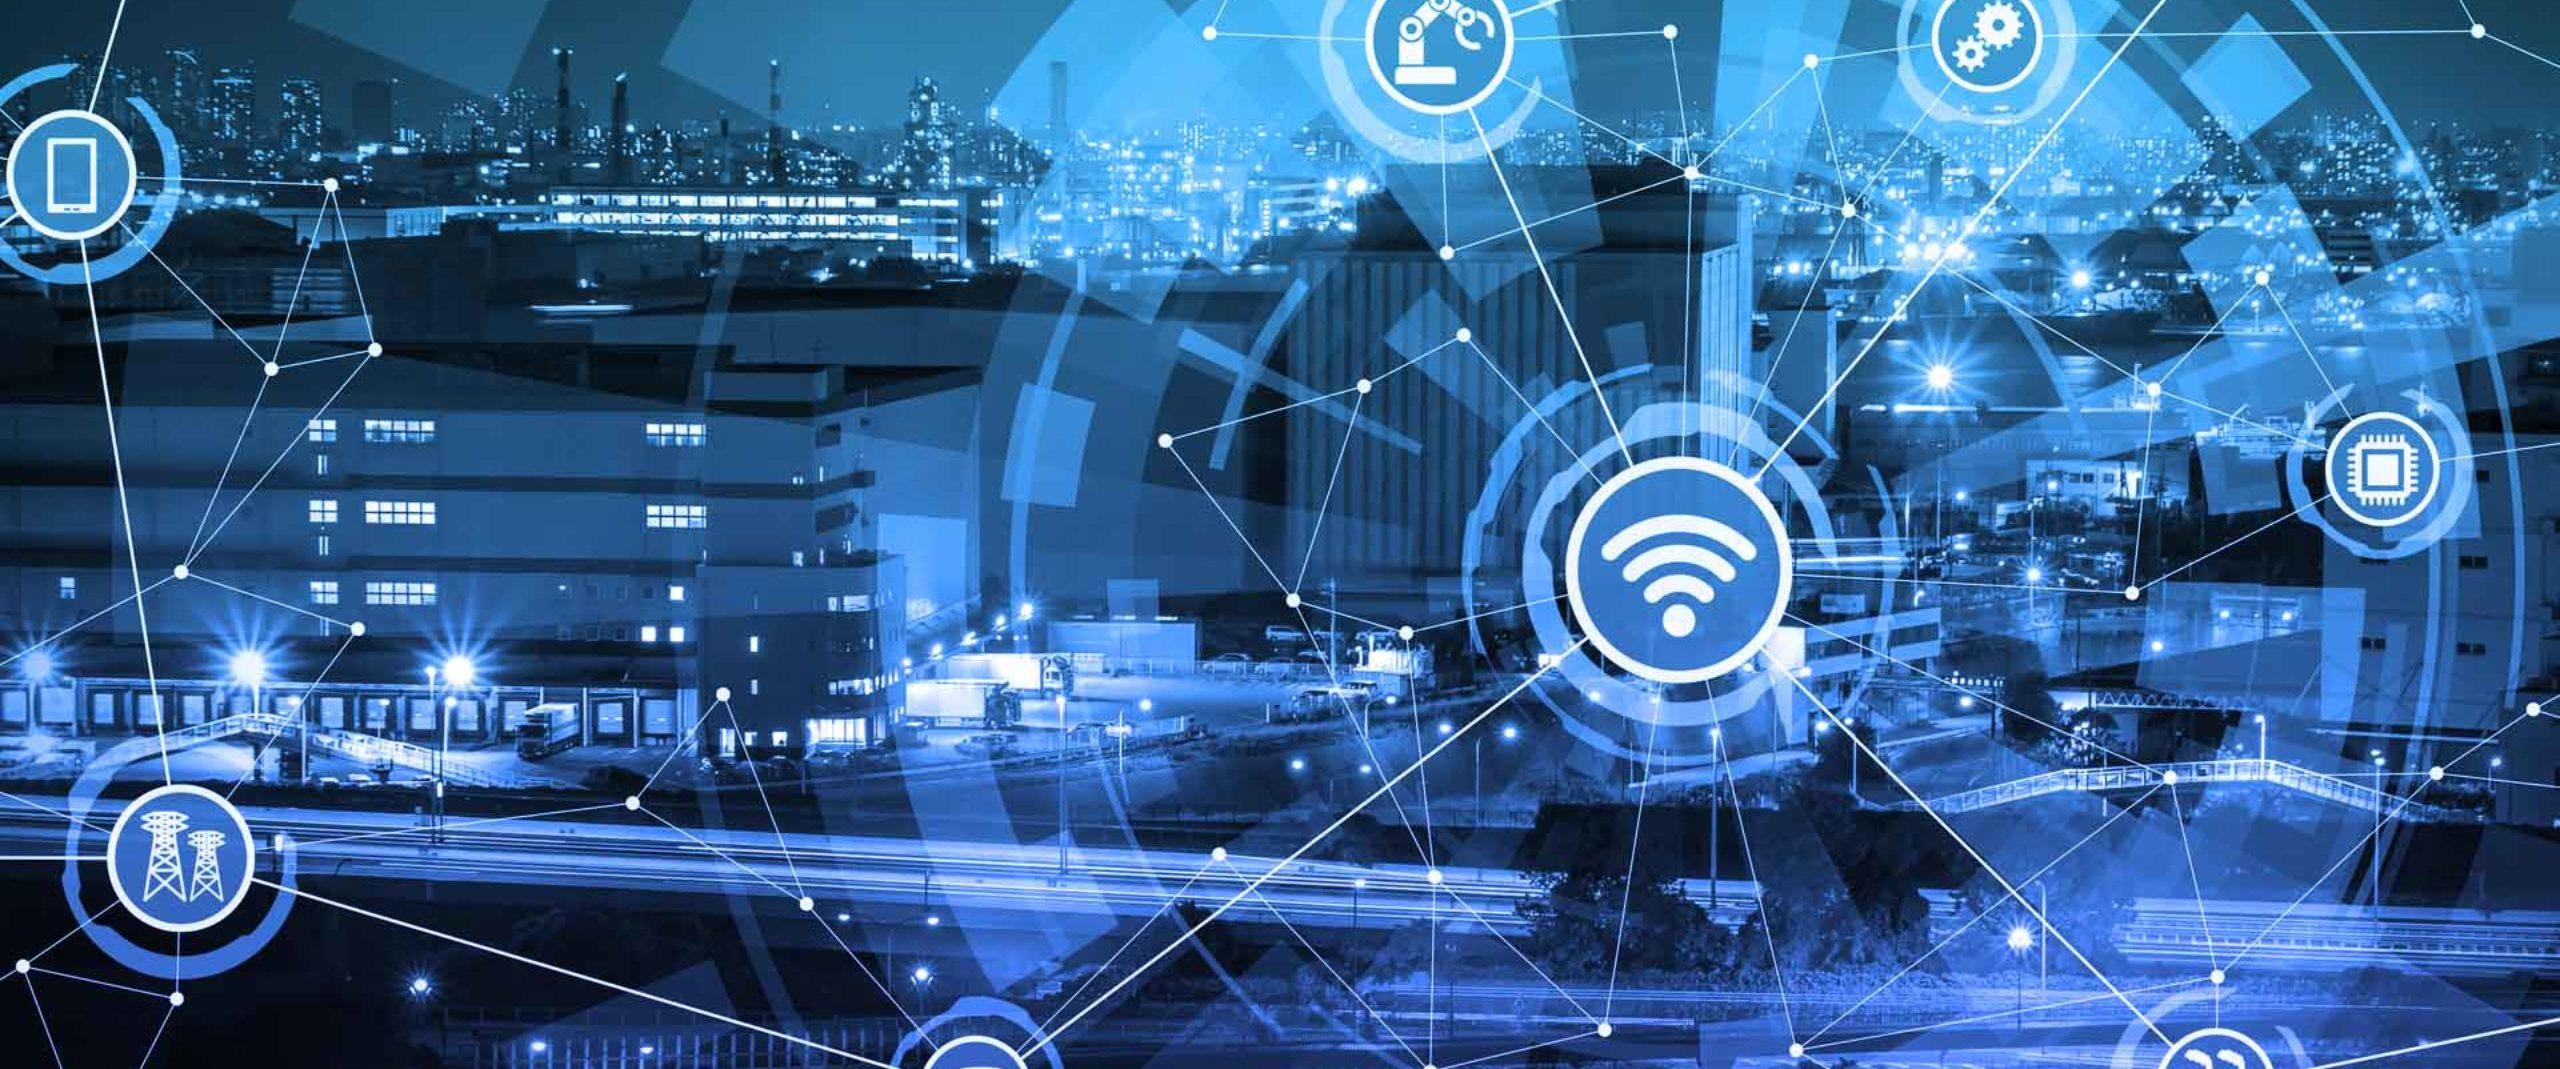 Microsoft Dynamics 365 Field Service IoT meilleure efficacité